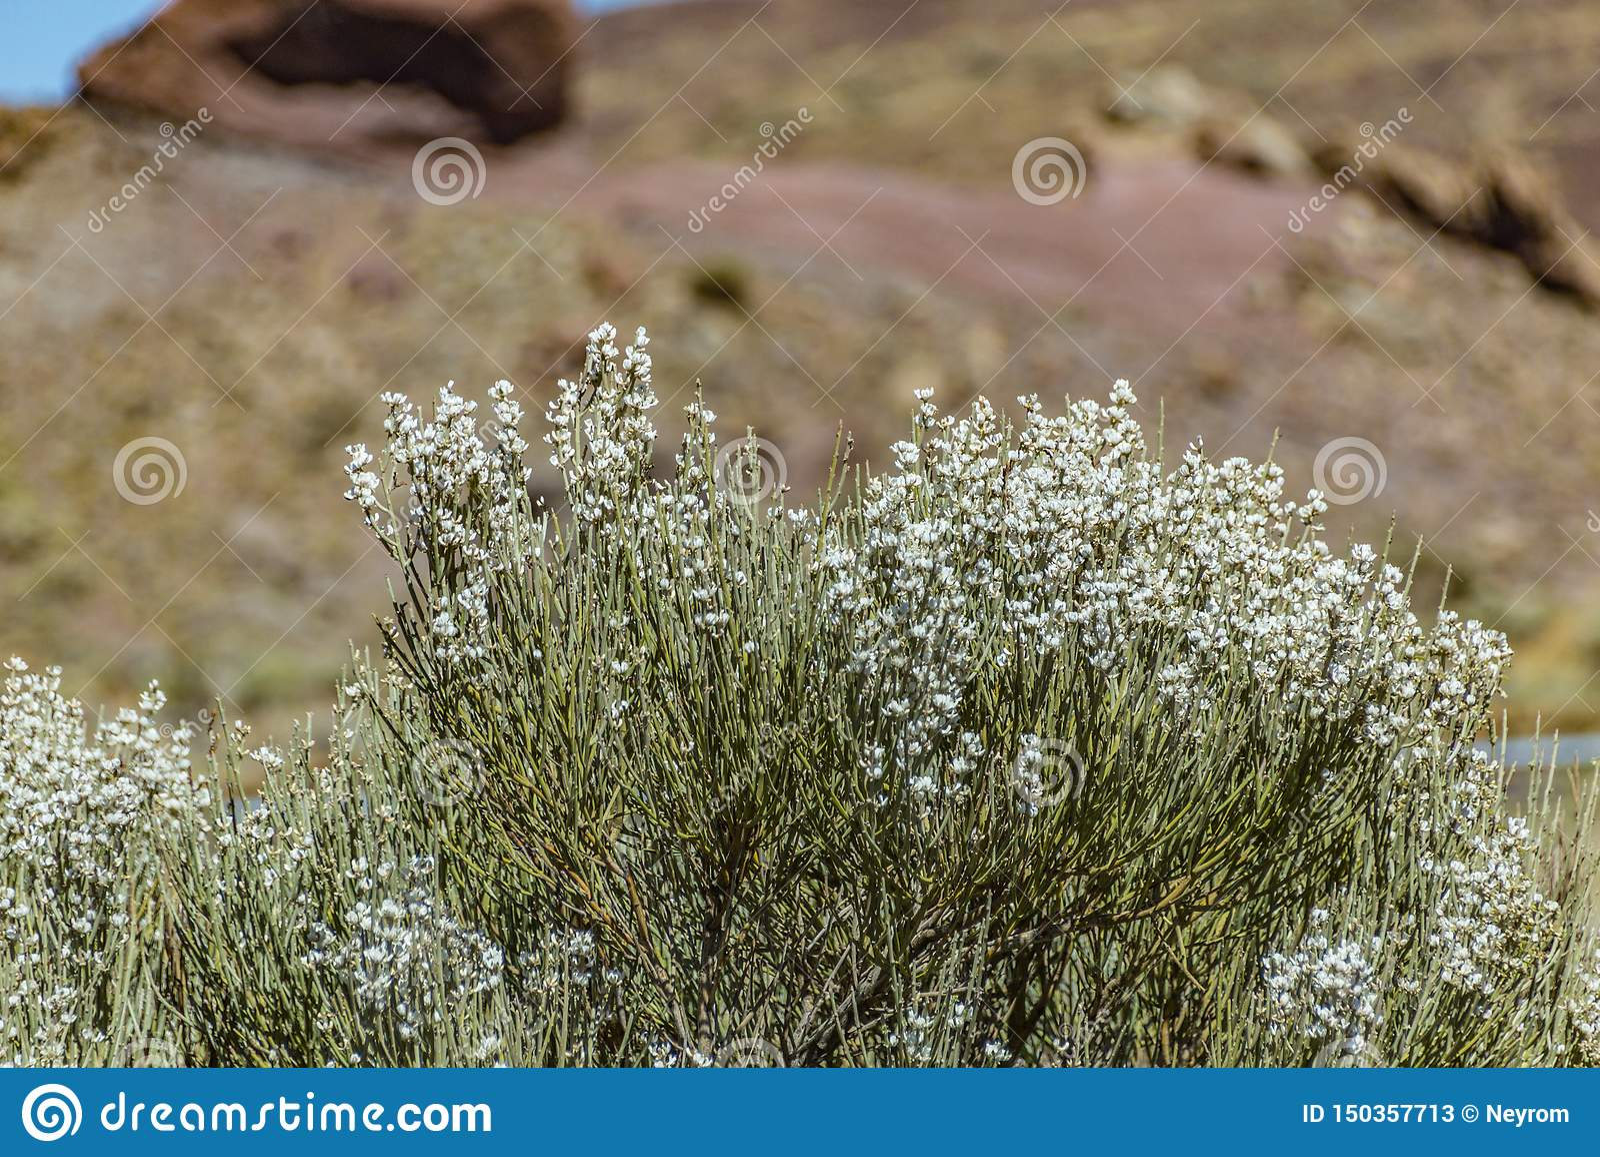 Blooming endemic bush. White flowers of Retama rhodorhizoides. Red lava rocks on the blurred background National Park Teide,